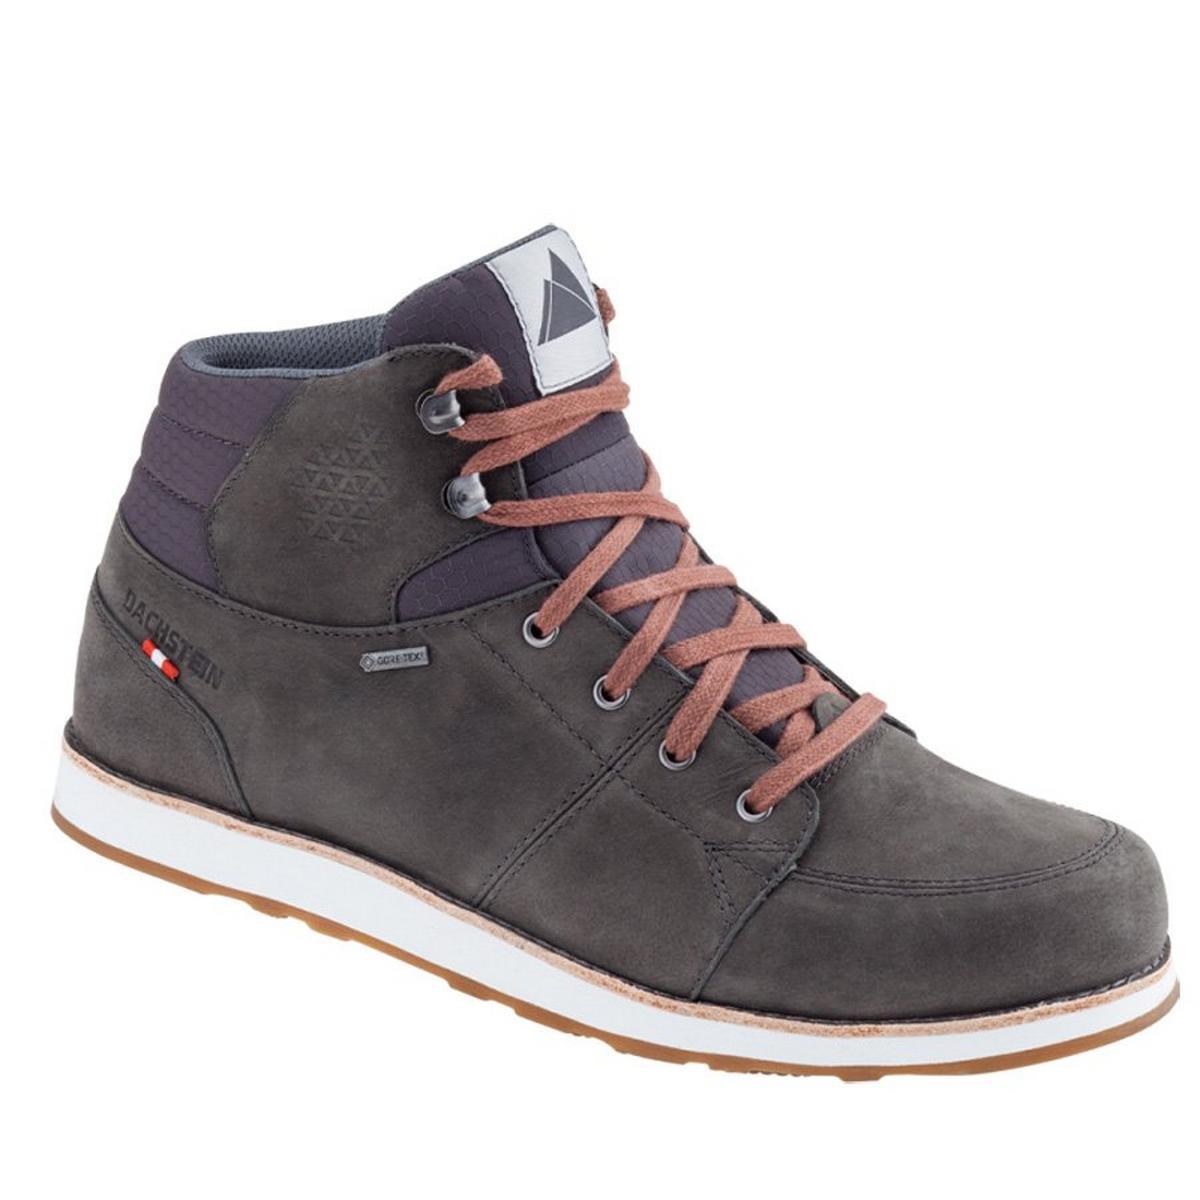 Dachstein Men's Hubert GTX Boot - Grey